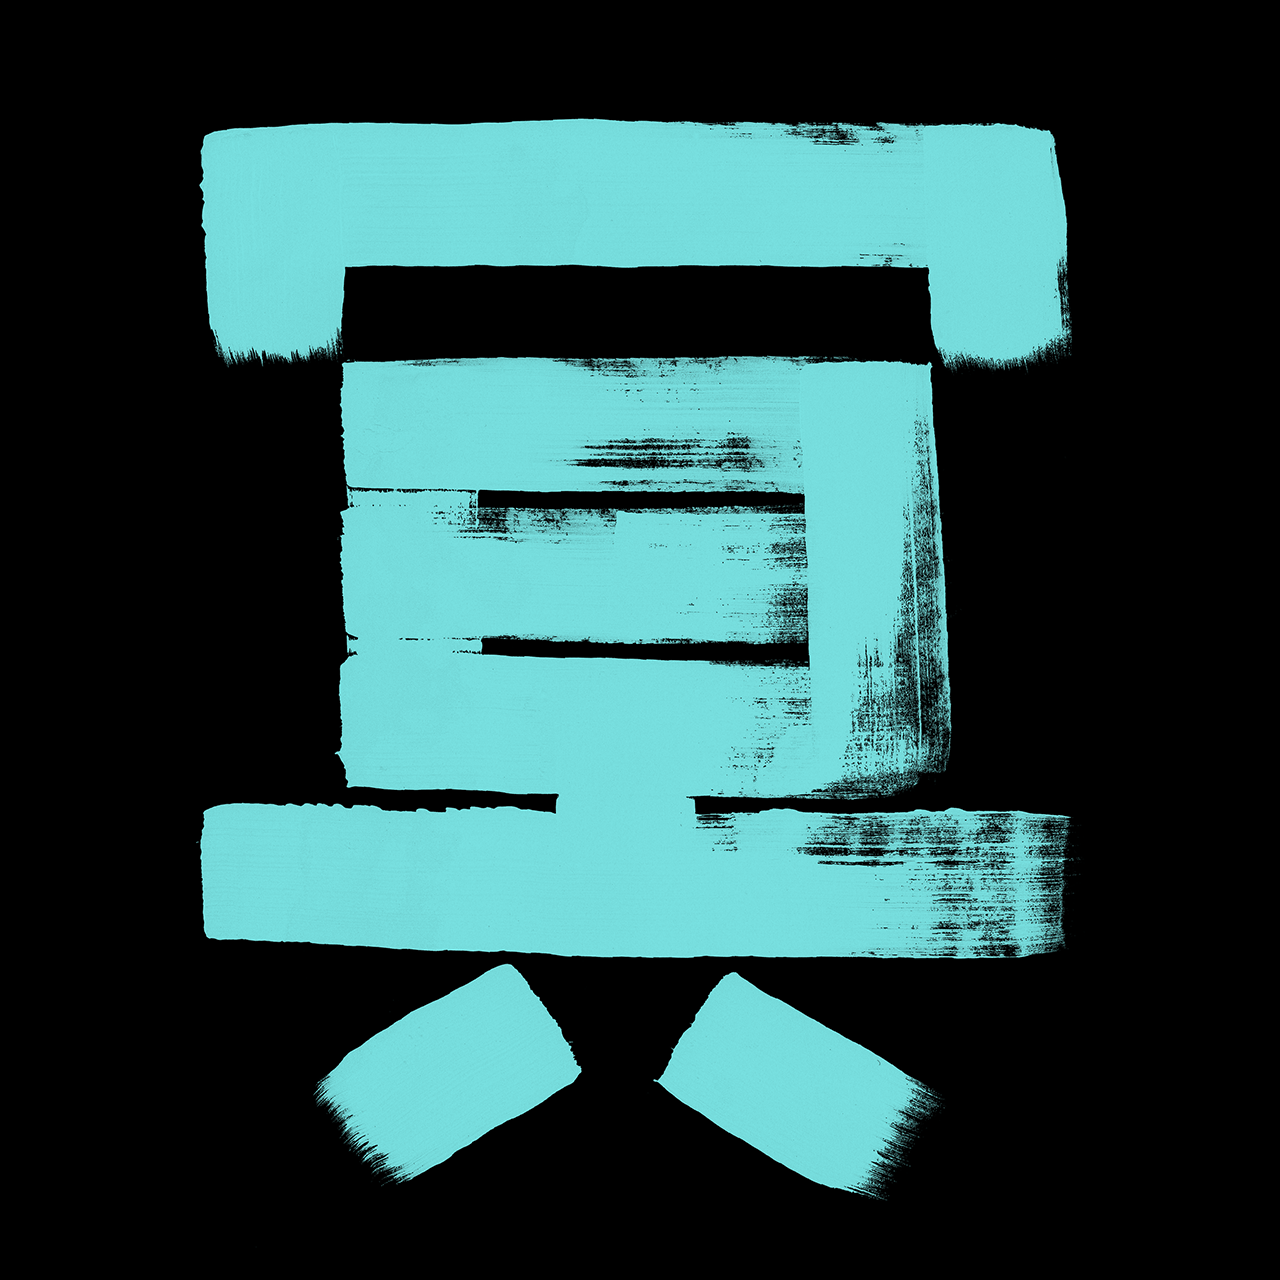 Katakana_PaintedKanji-14.png